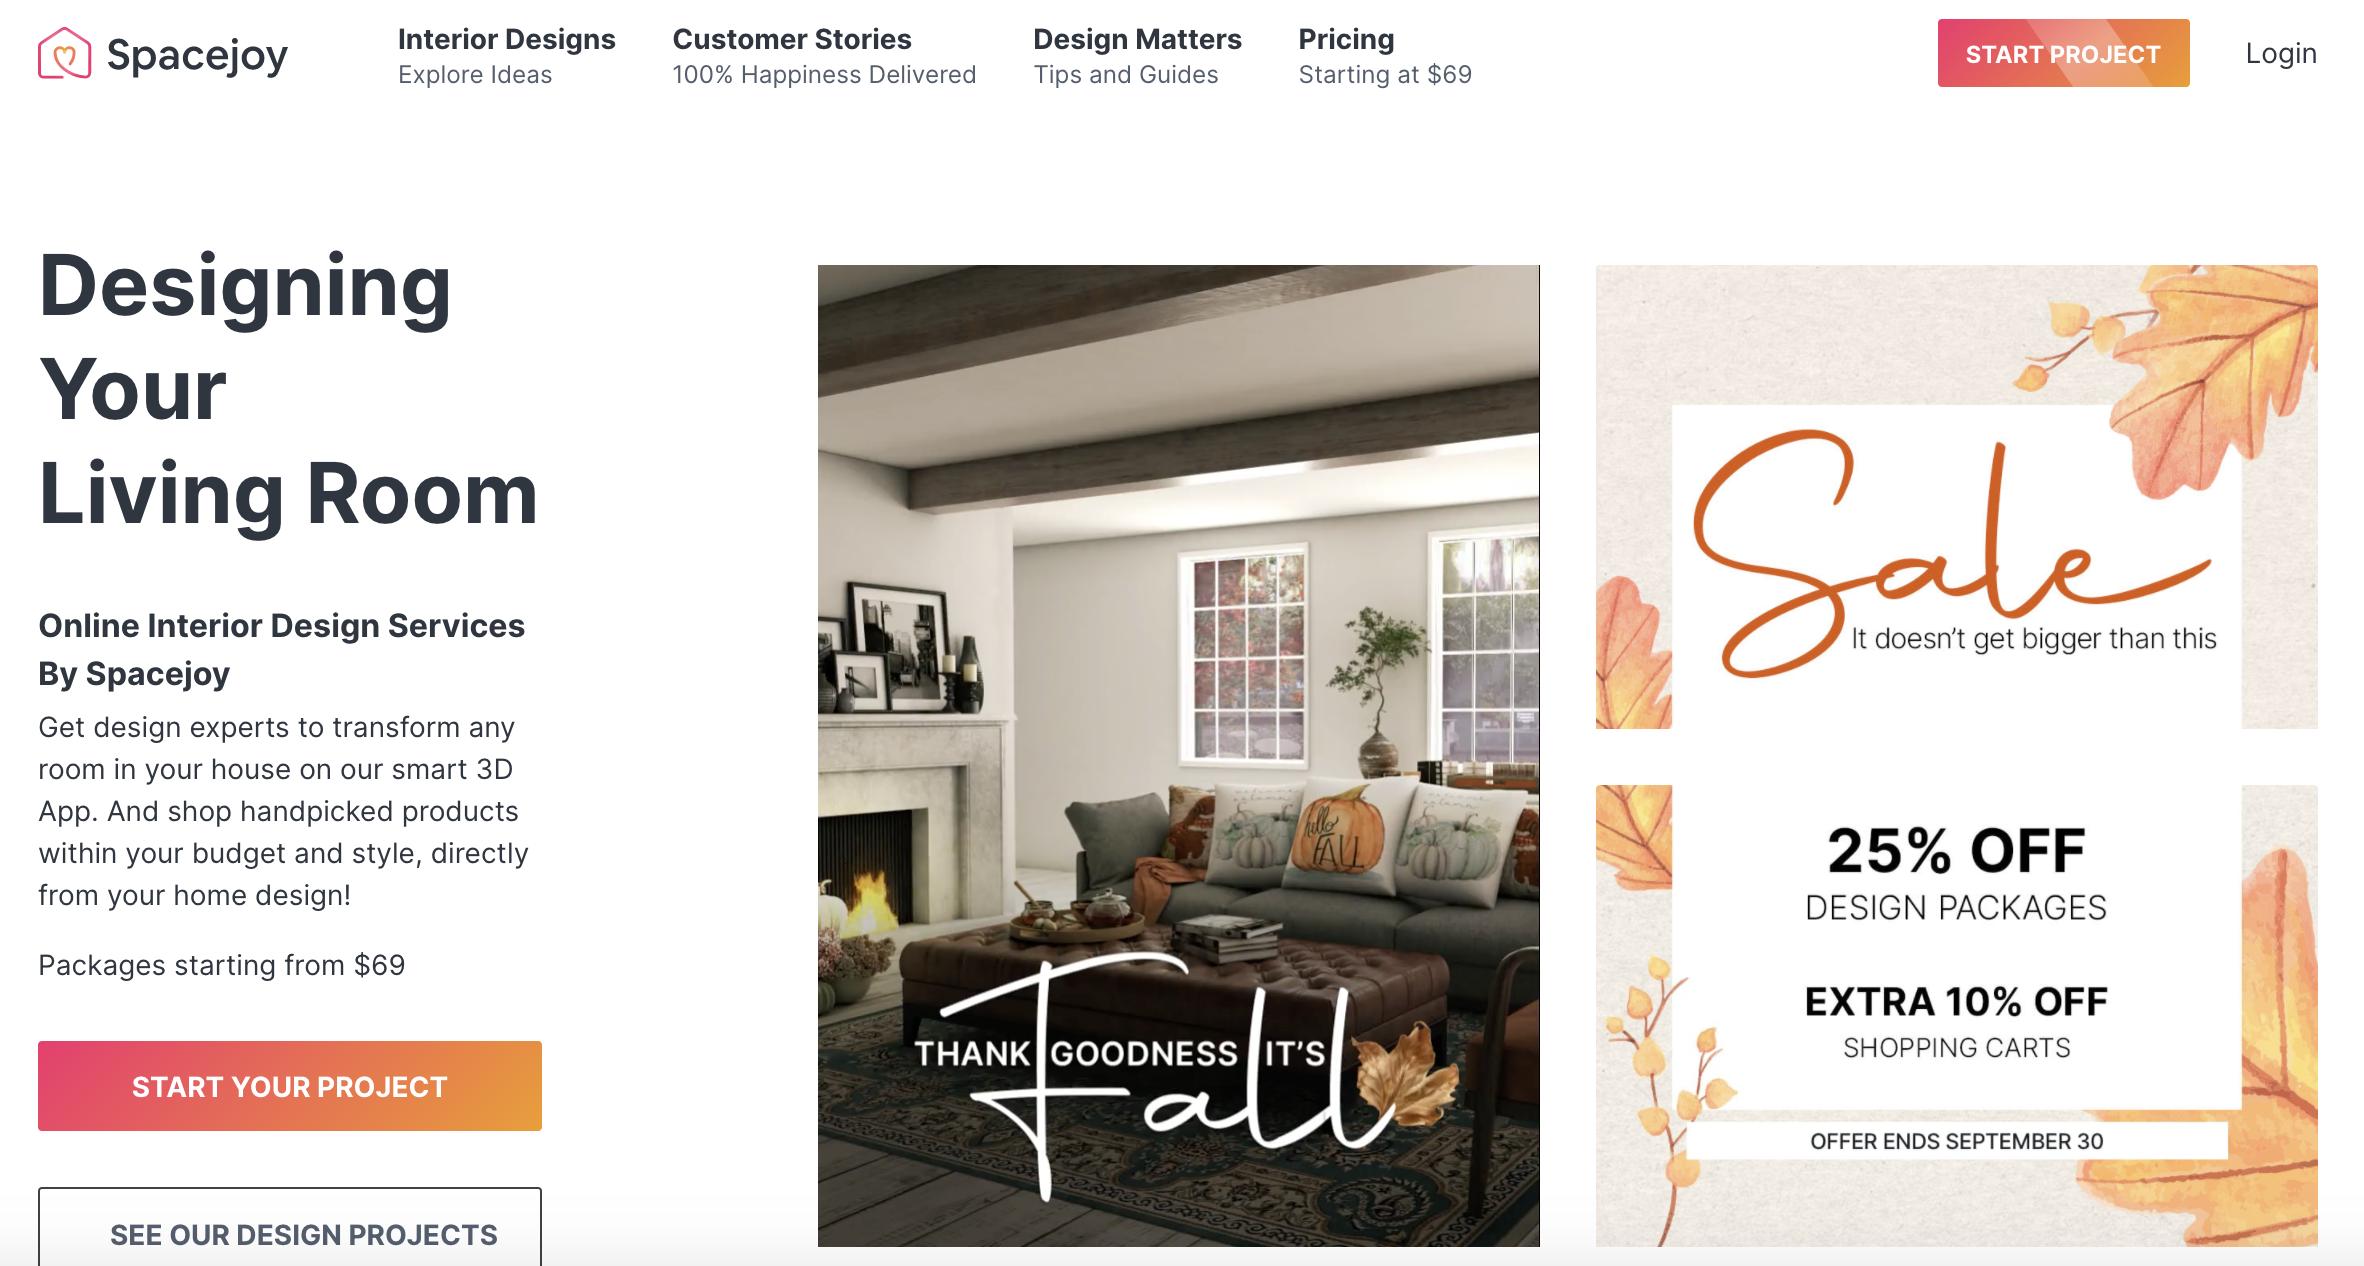 Online Interior Design Services By Spacejoy | Spacejoy India | Spacejoy USA